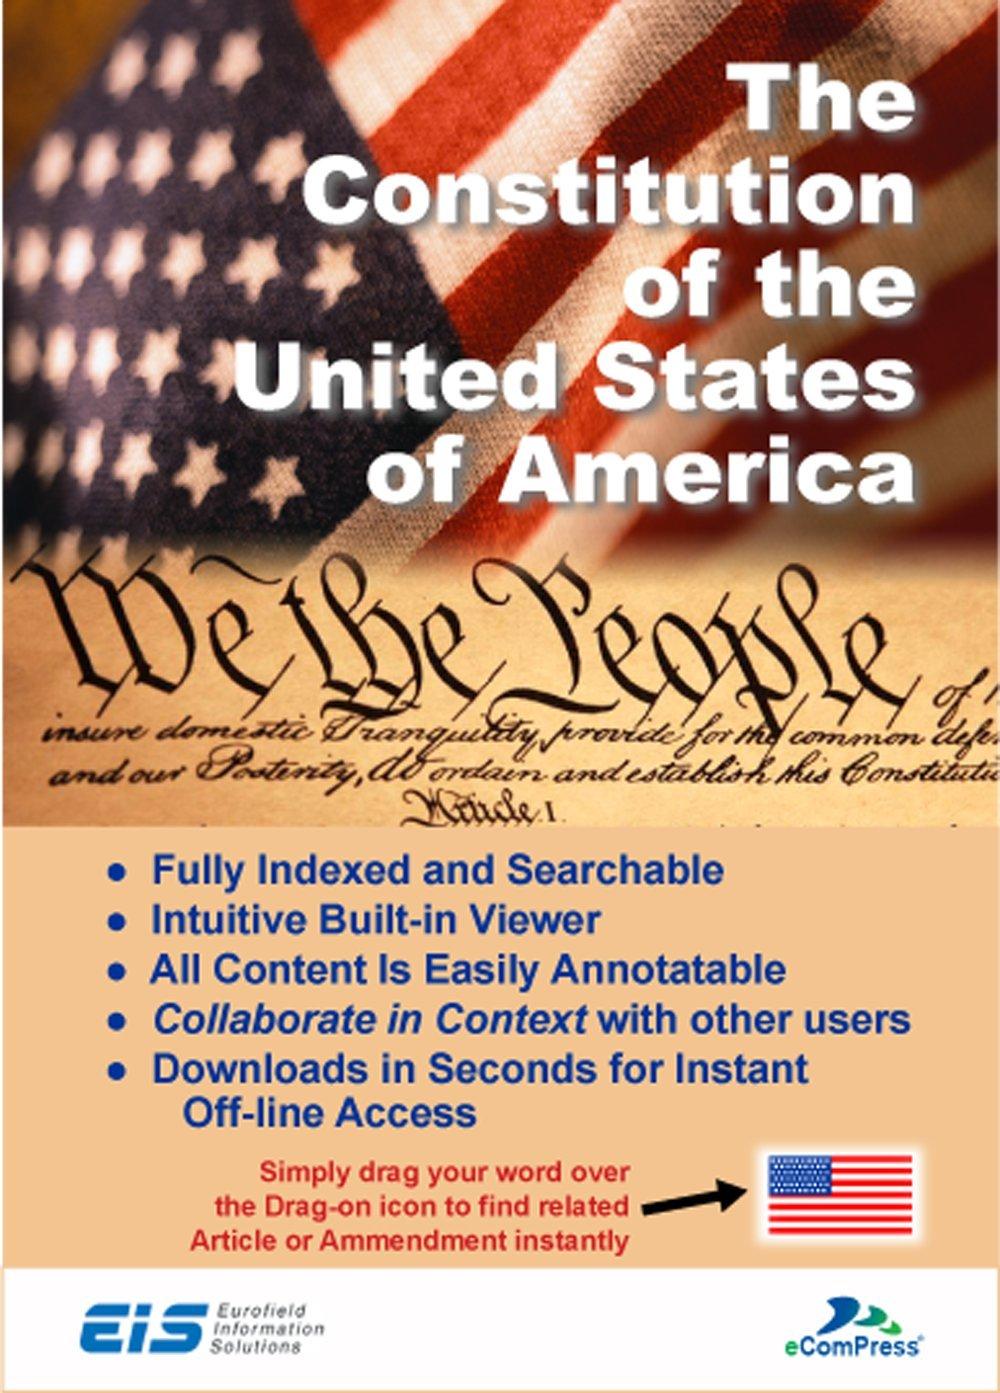 Free Windows Download of U.S. Constitution PC App